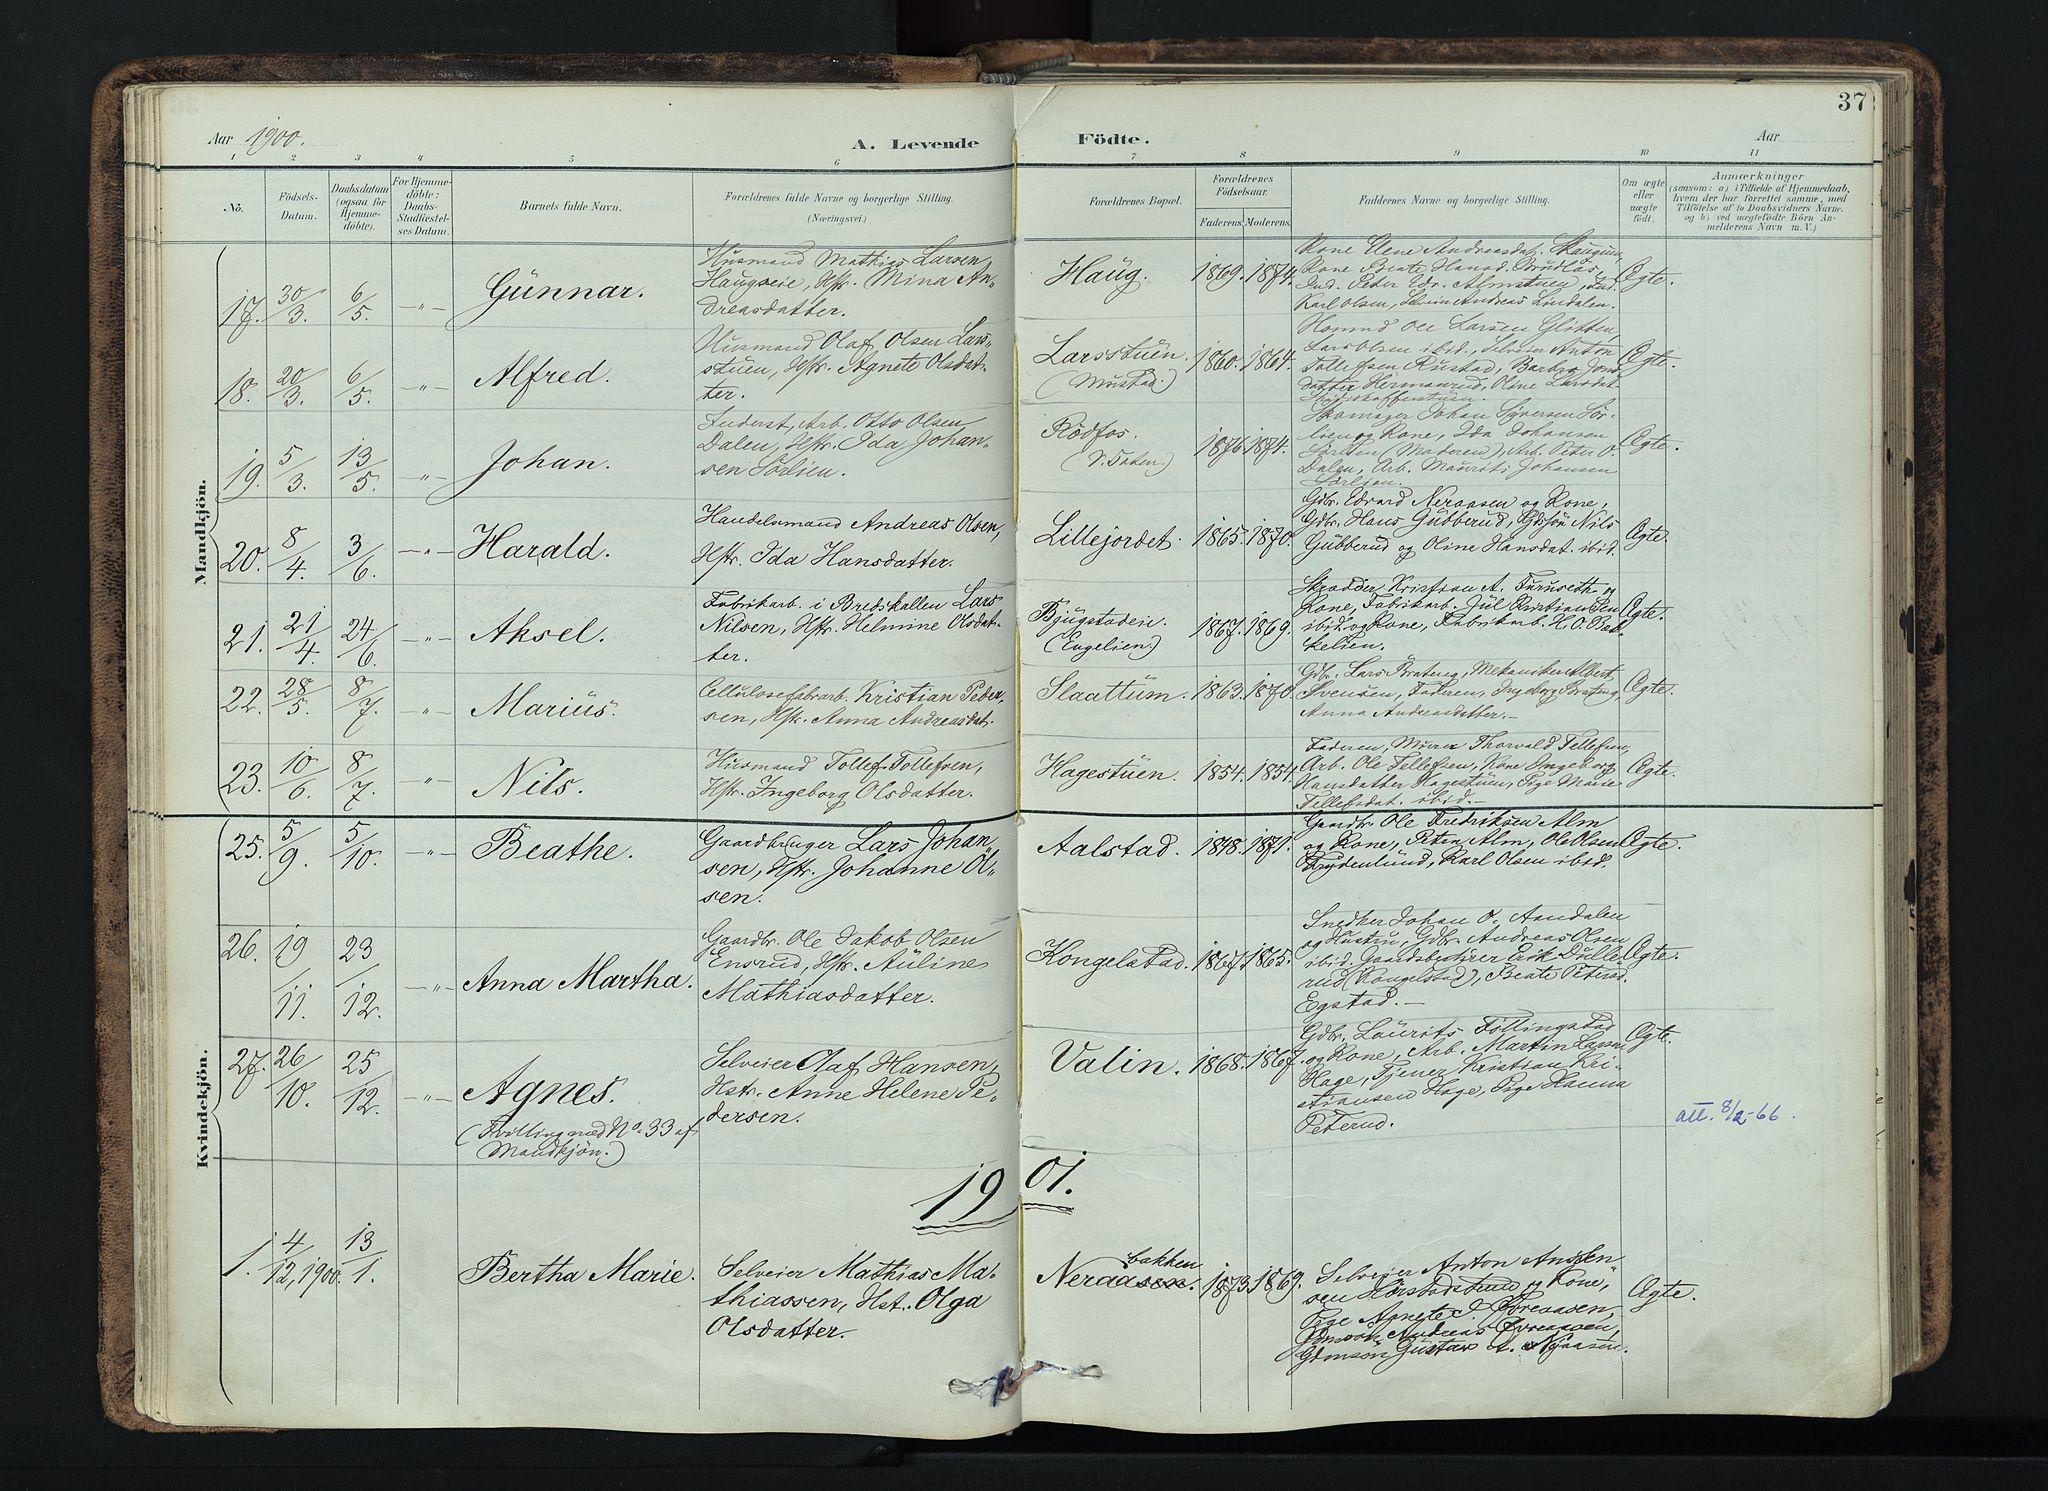 SAH, Vardal prestekontor, H/Ha/Haa/L0019: Ministerialbok nr. 19, 1893-1907, s. 37